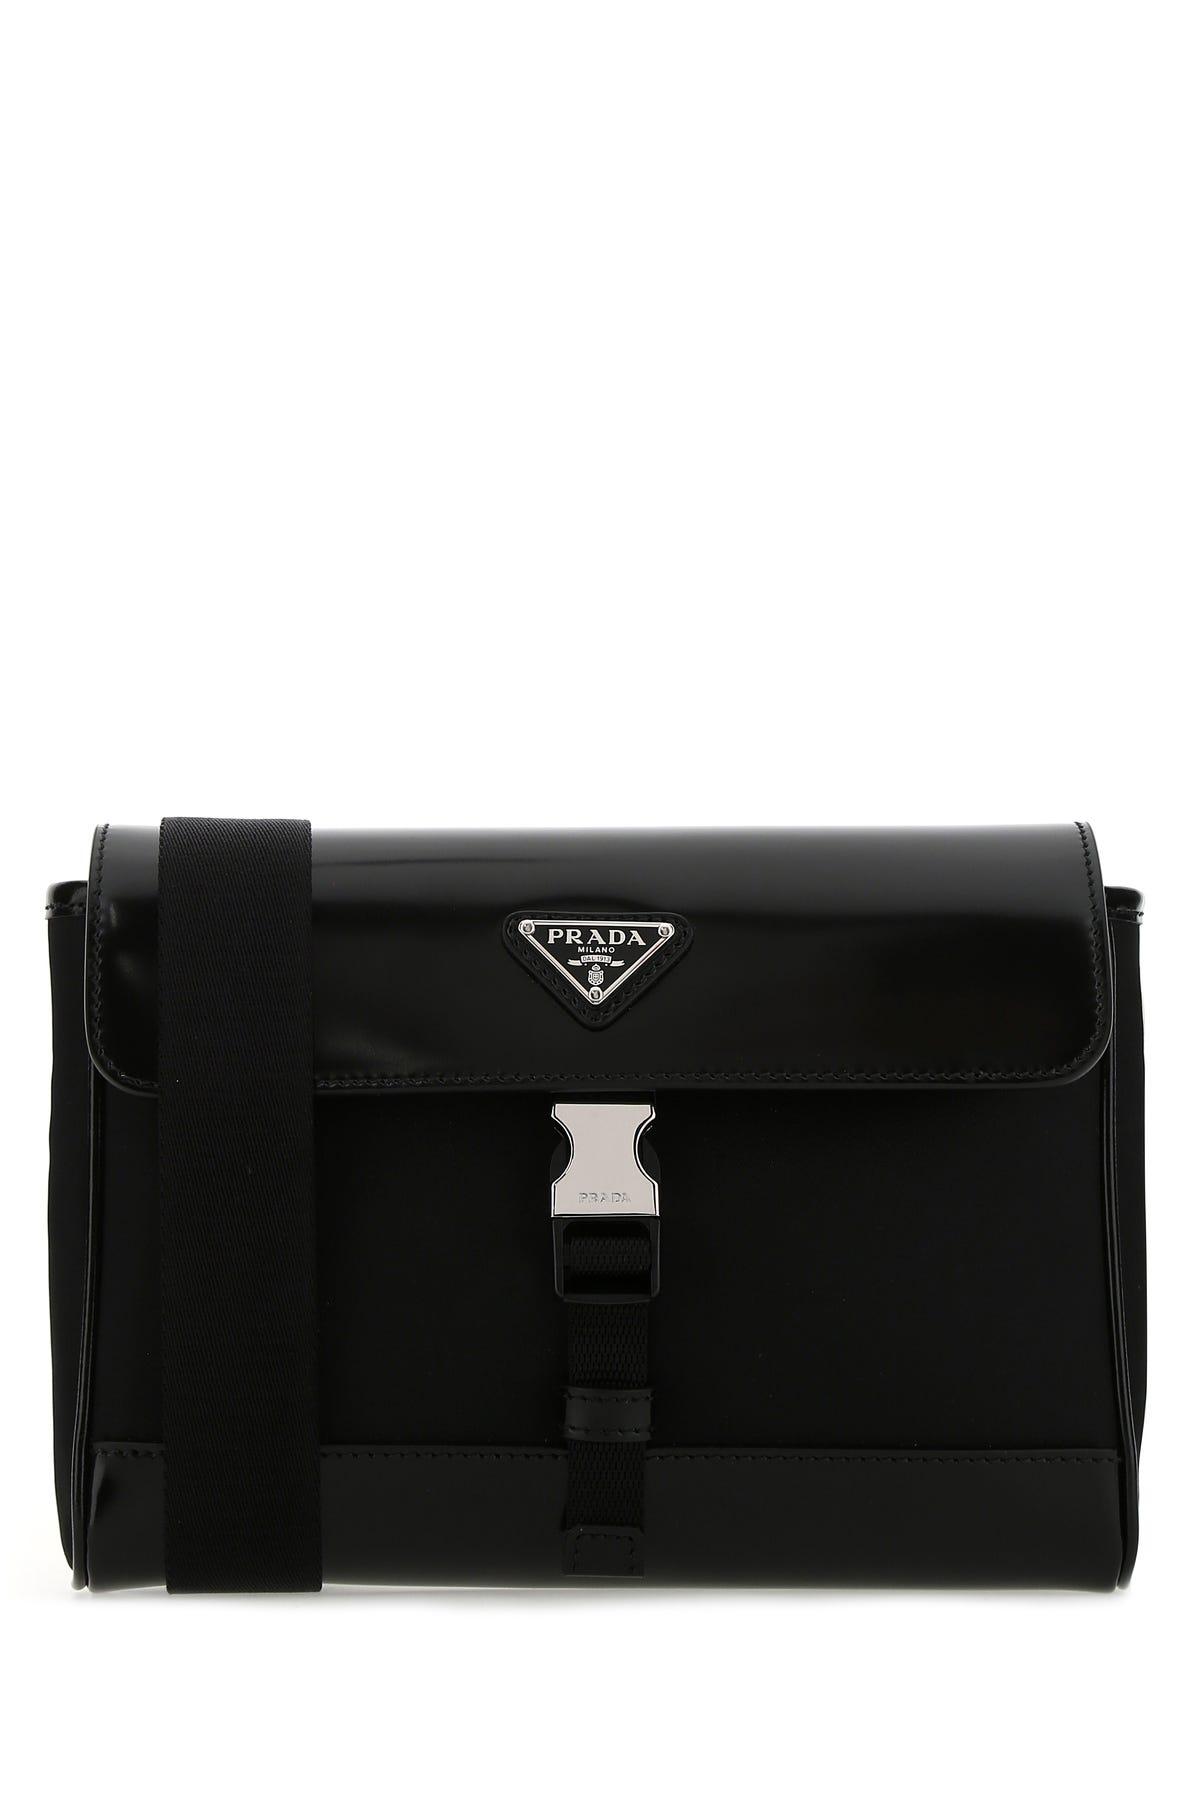 Prada Black Re-nylon And Leather Crossbody Bag  Nd  Uomo Tu